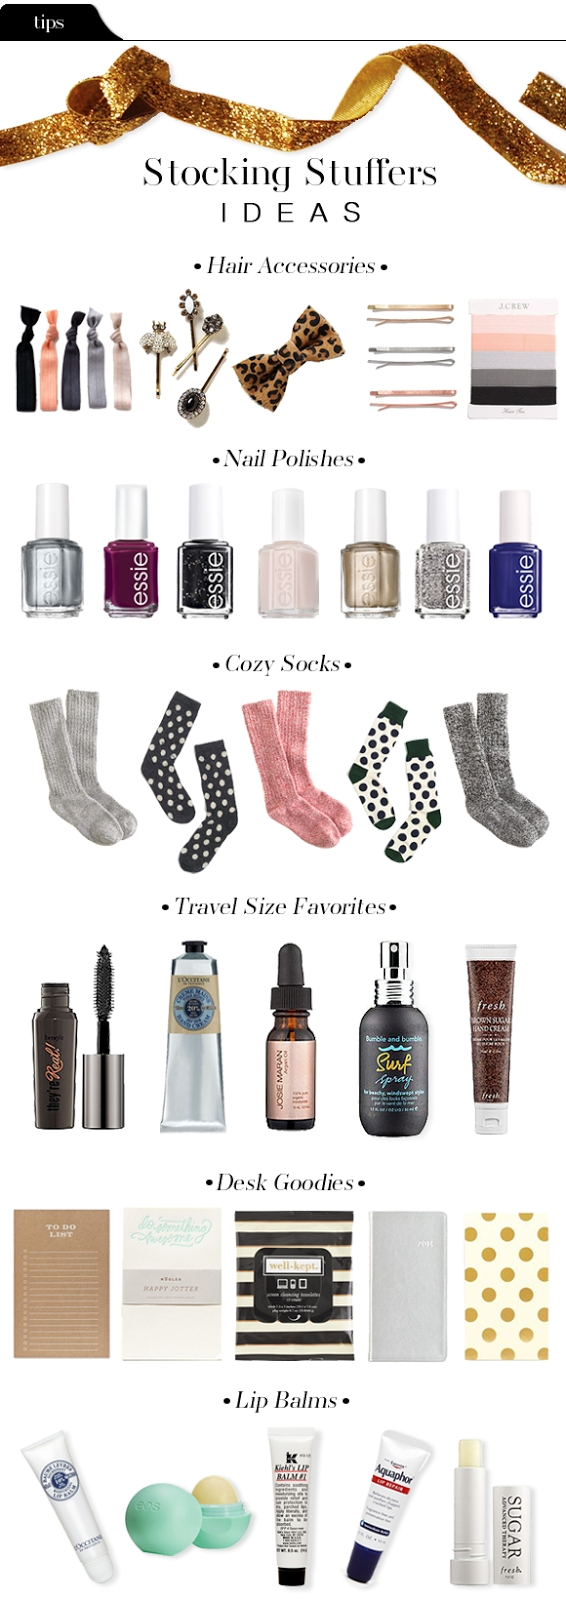 10 Wonderful Stocking Stuffer Ideas For Girlfriend tips file stocking stuffers ideas stocking stuffers stockings